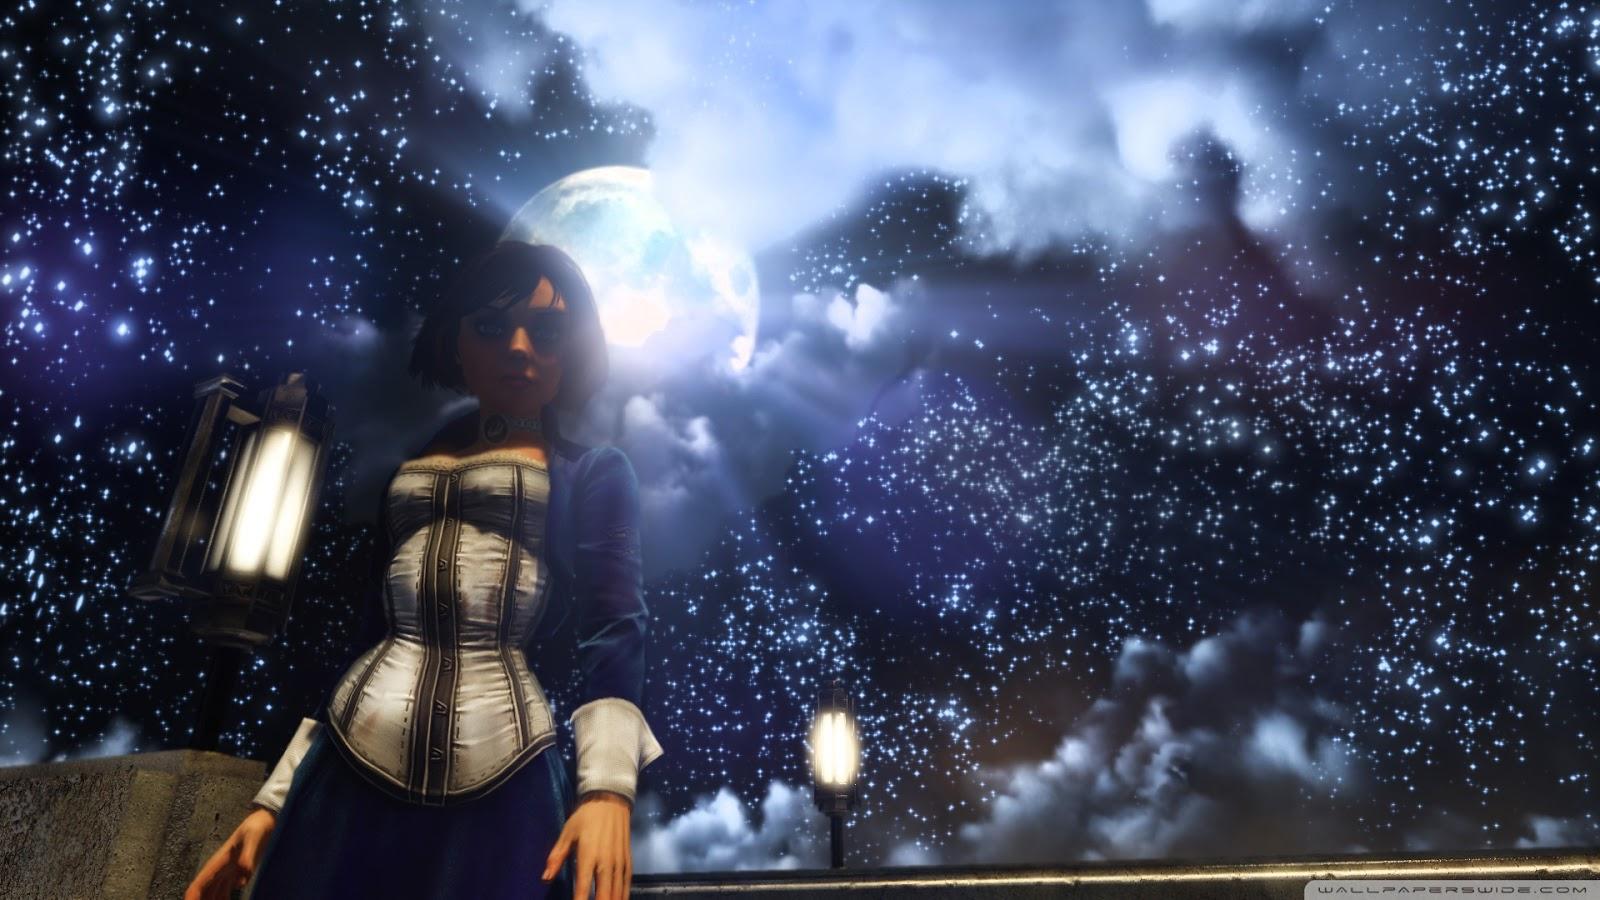 Killzone Shadow Fall Wallpaper 1080p Wallpapers Hd Bioshock Game Wallpapars Hd Fondos De